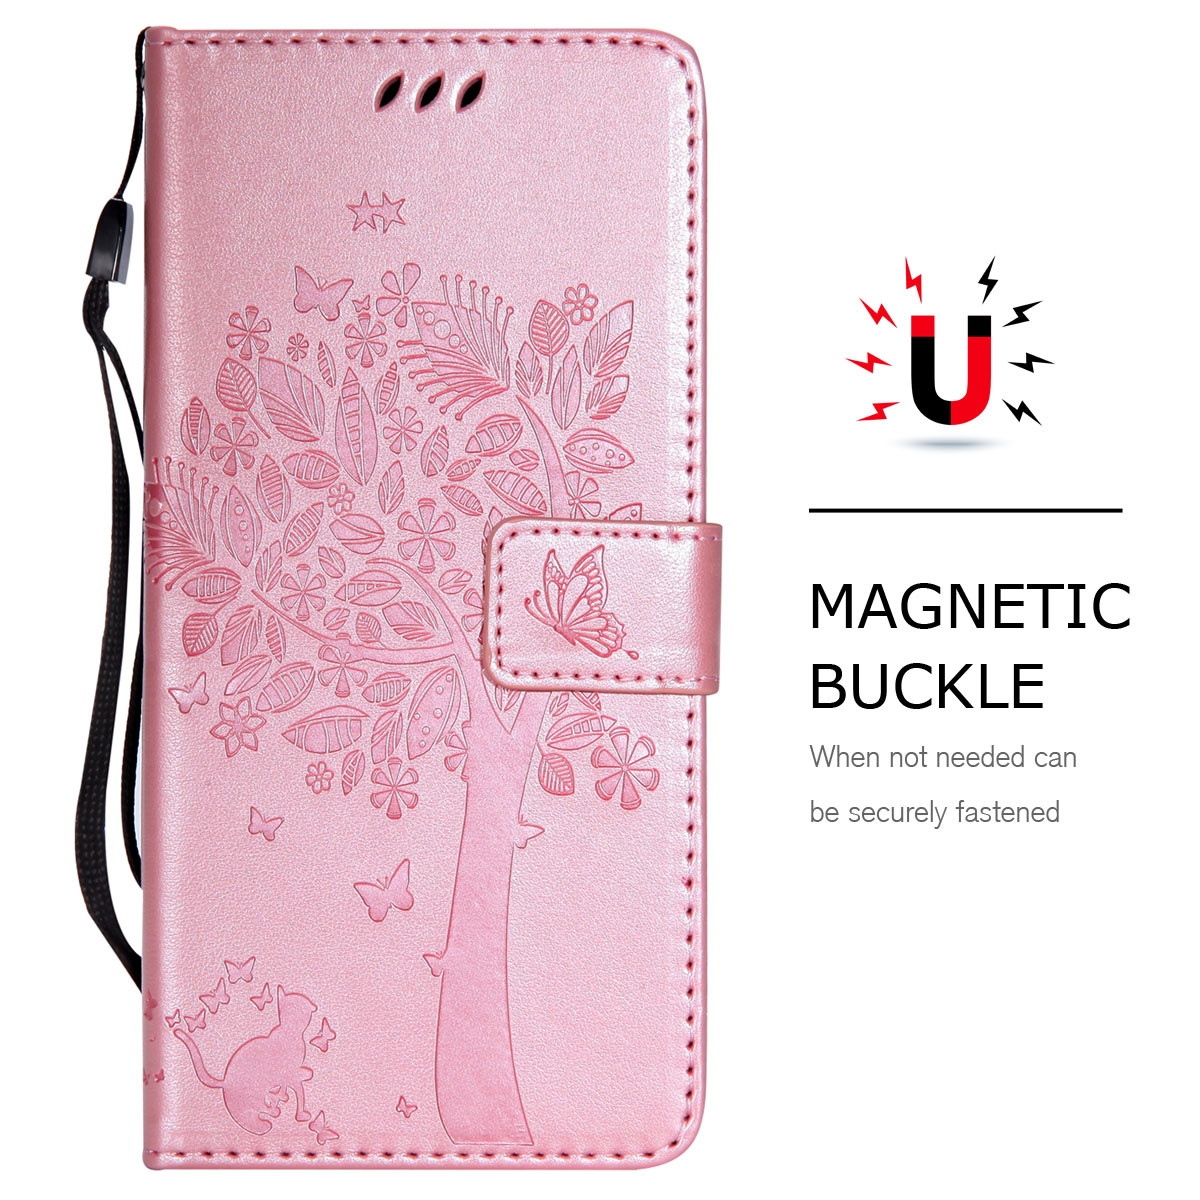 Magnetic-Leather-Credit-Card-Holder-Flip-Case-Cover-For-Google-Pixel-2-2-XL thumbnail 93